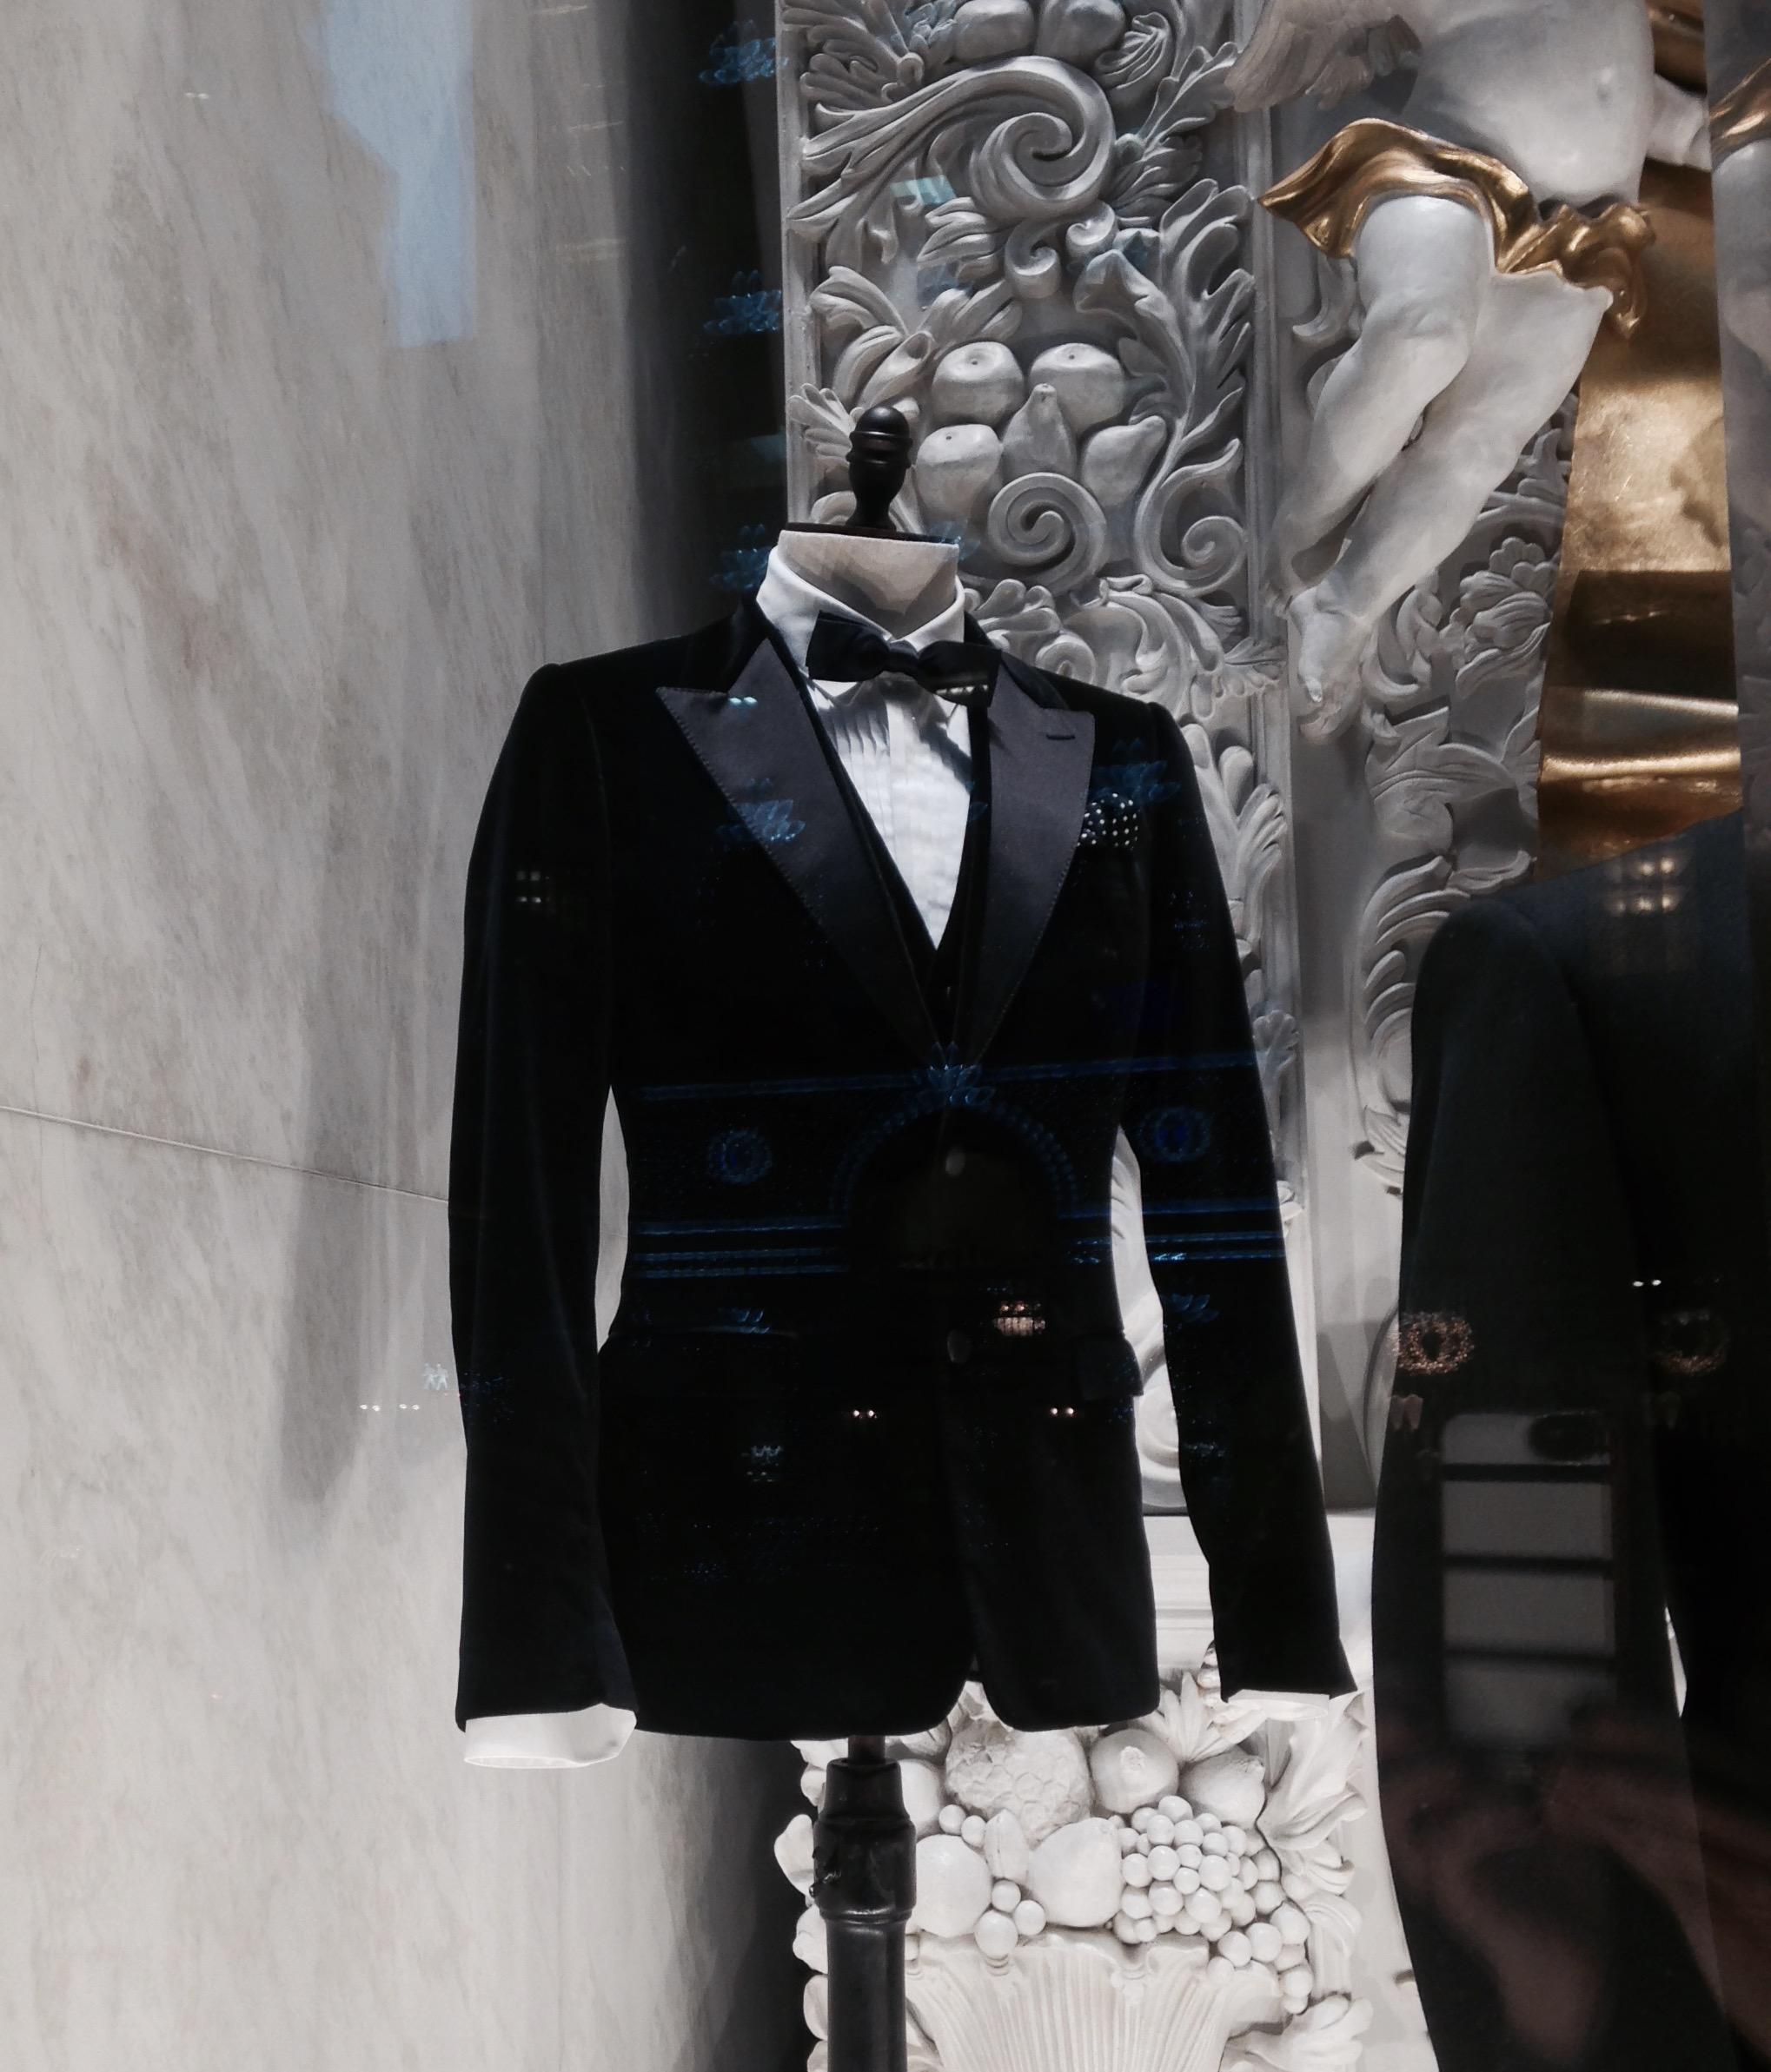 black tie etiquette photo - 1